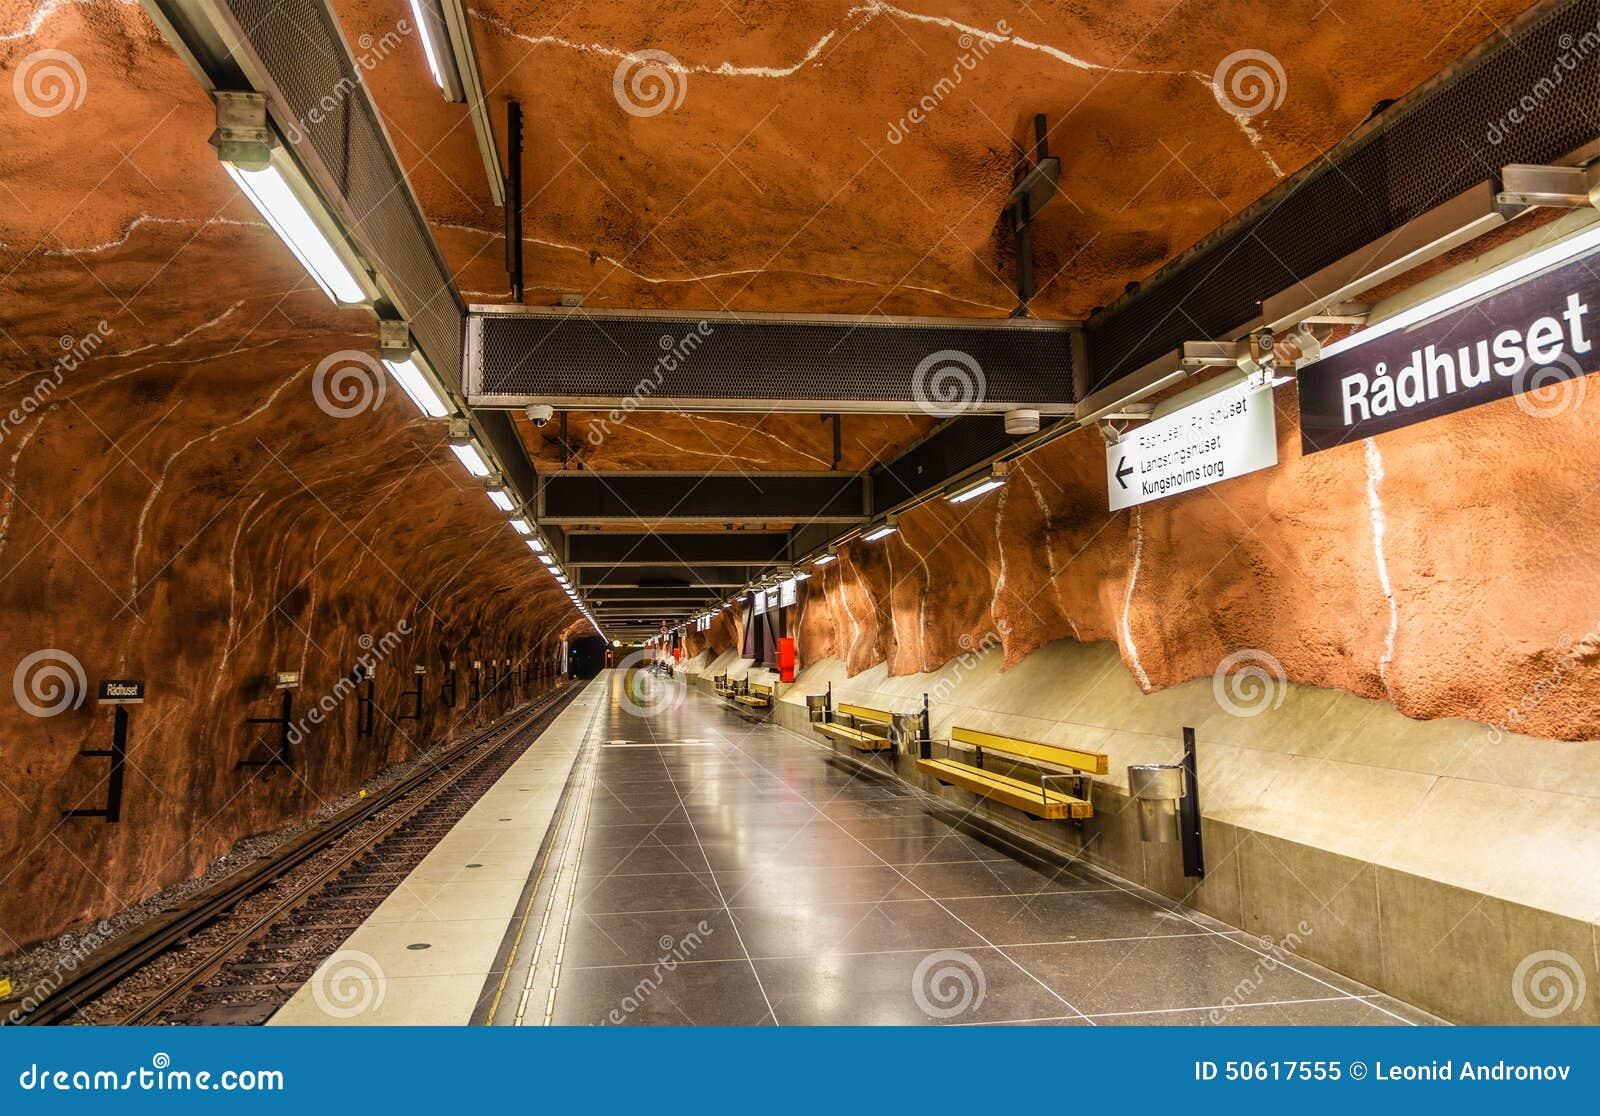 stockholm sweden may interior radhuset metro station o system called world s longest art 50617555